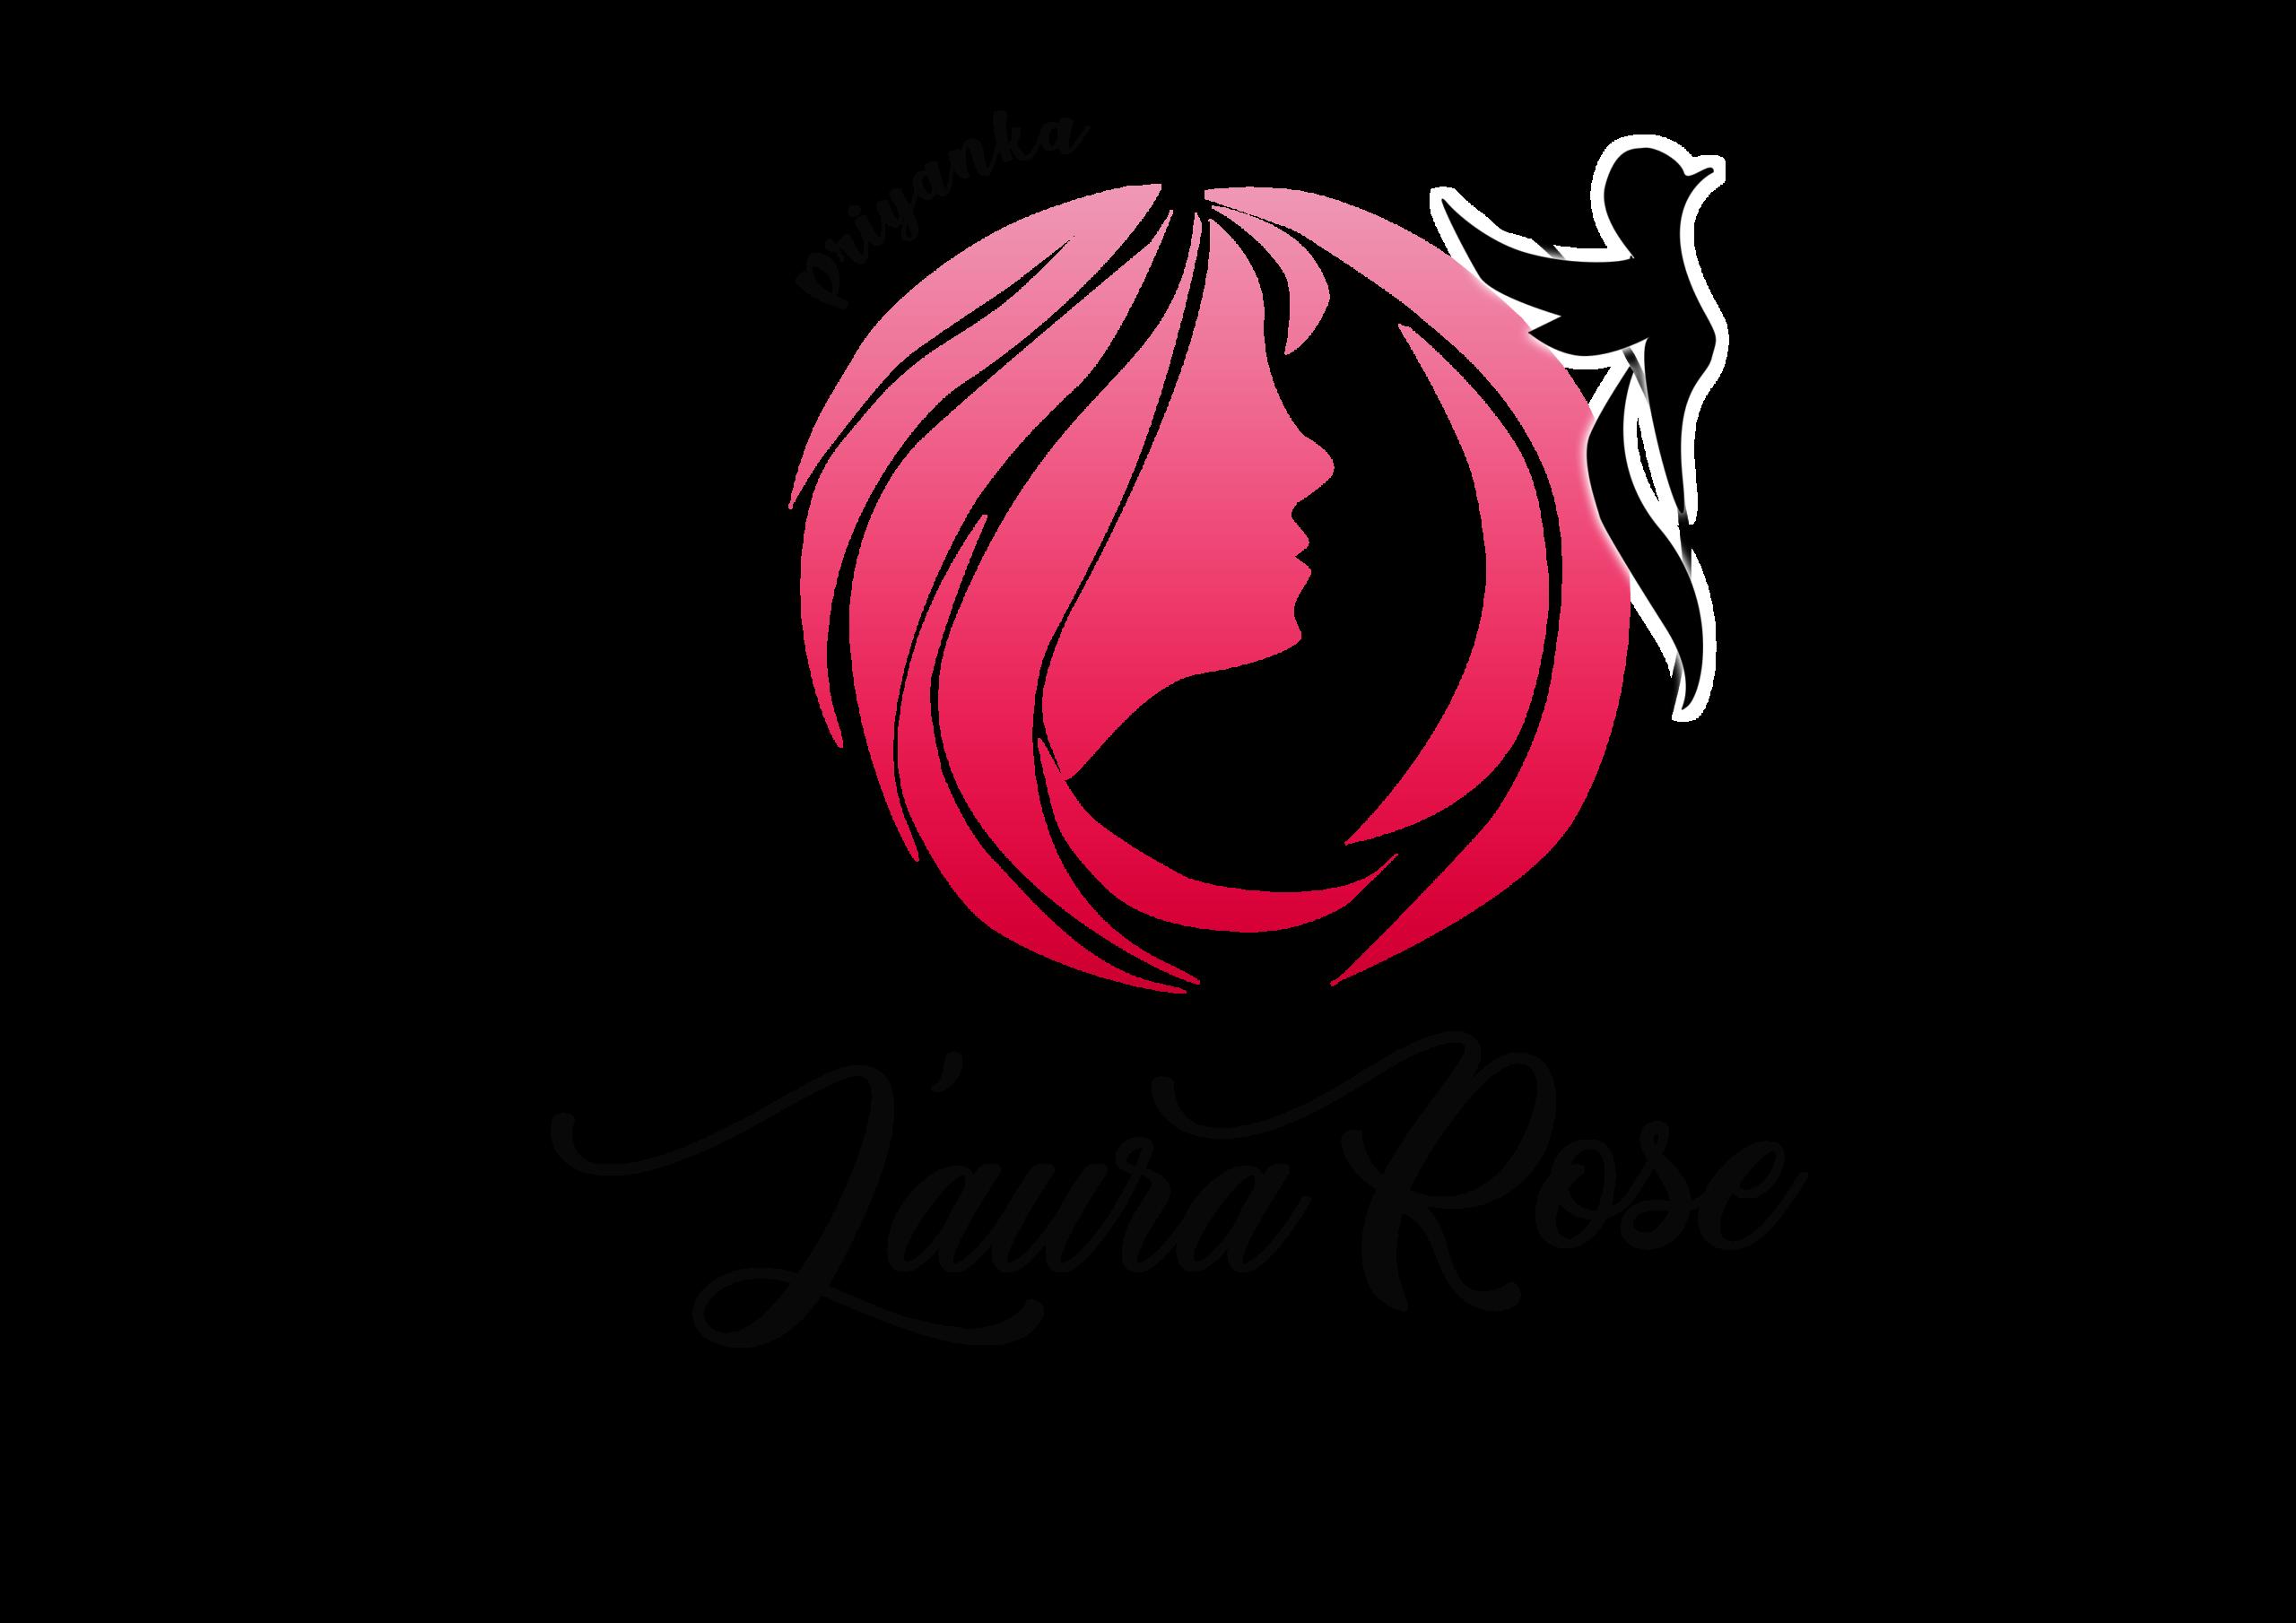 L'aura Rose